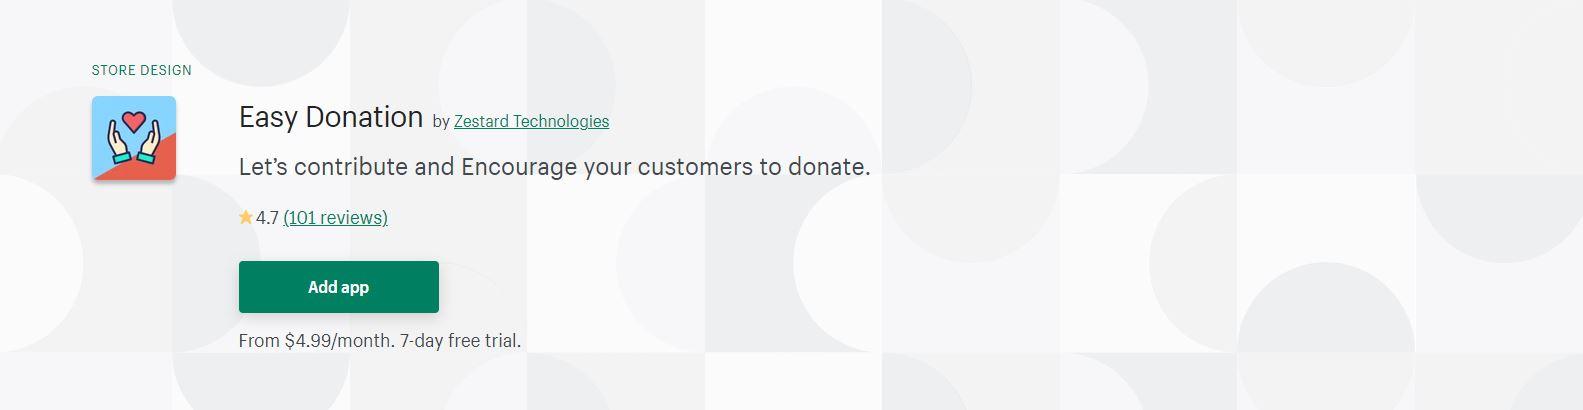 Easy Donation